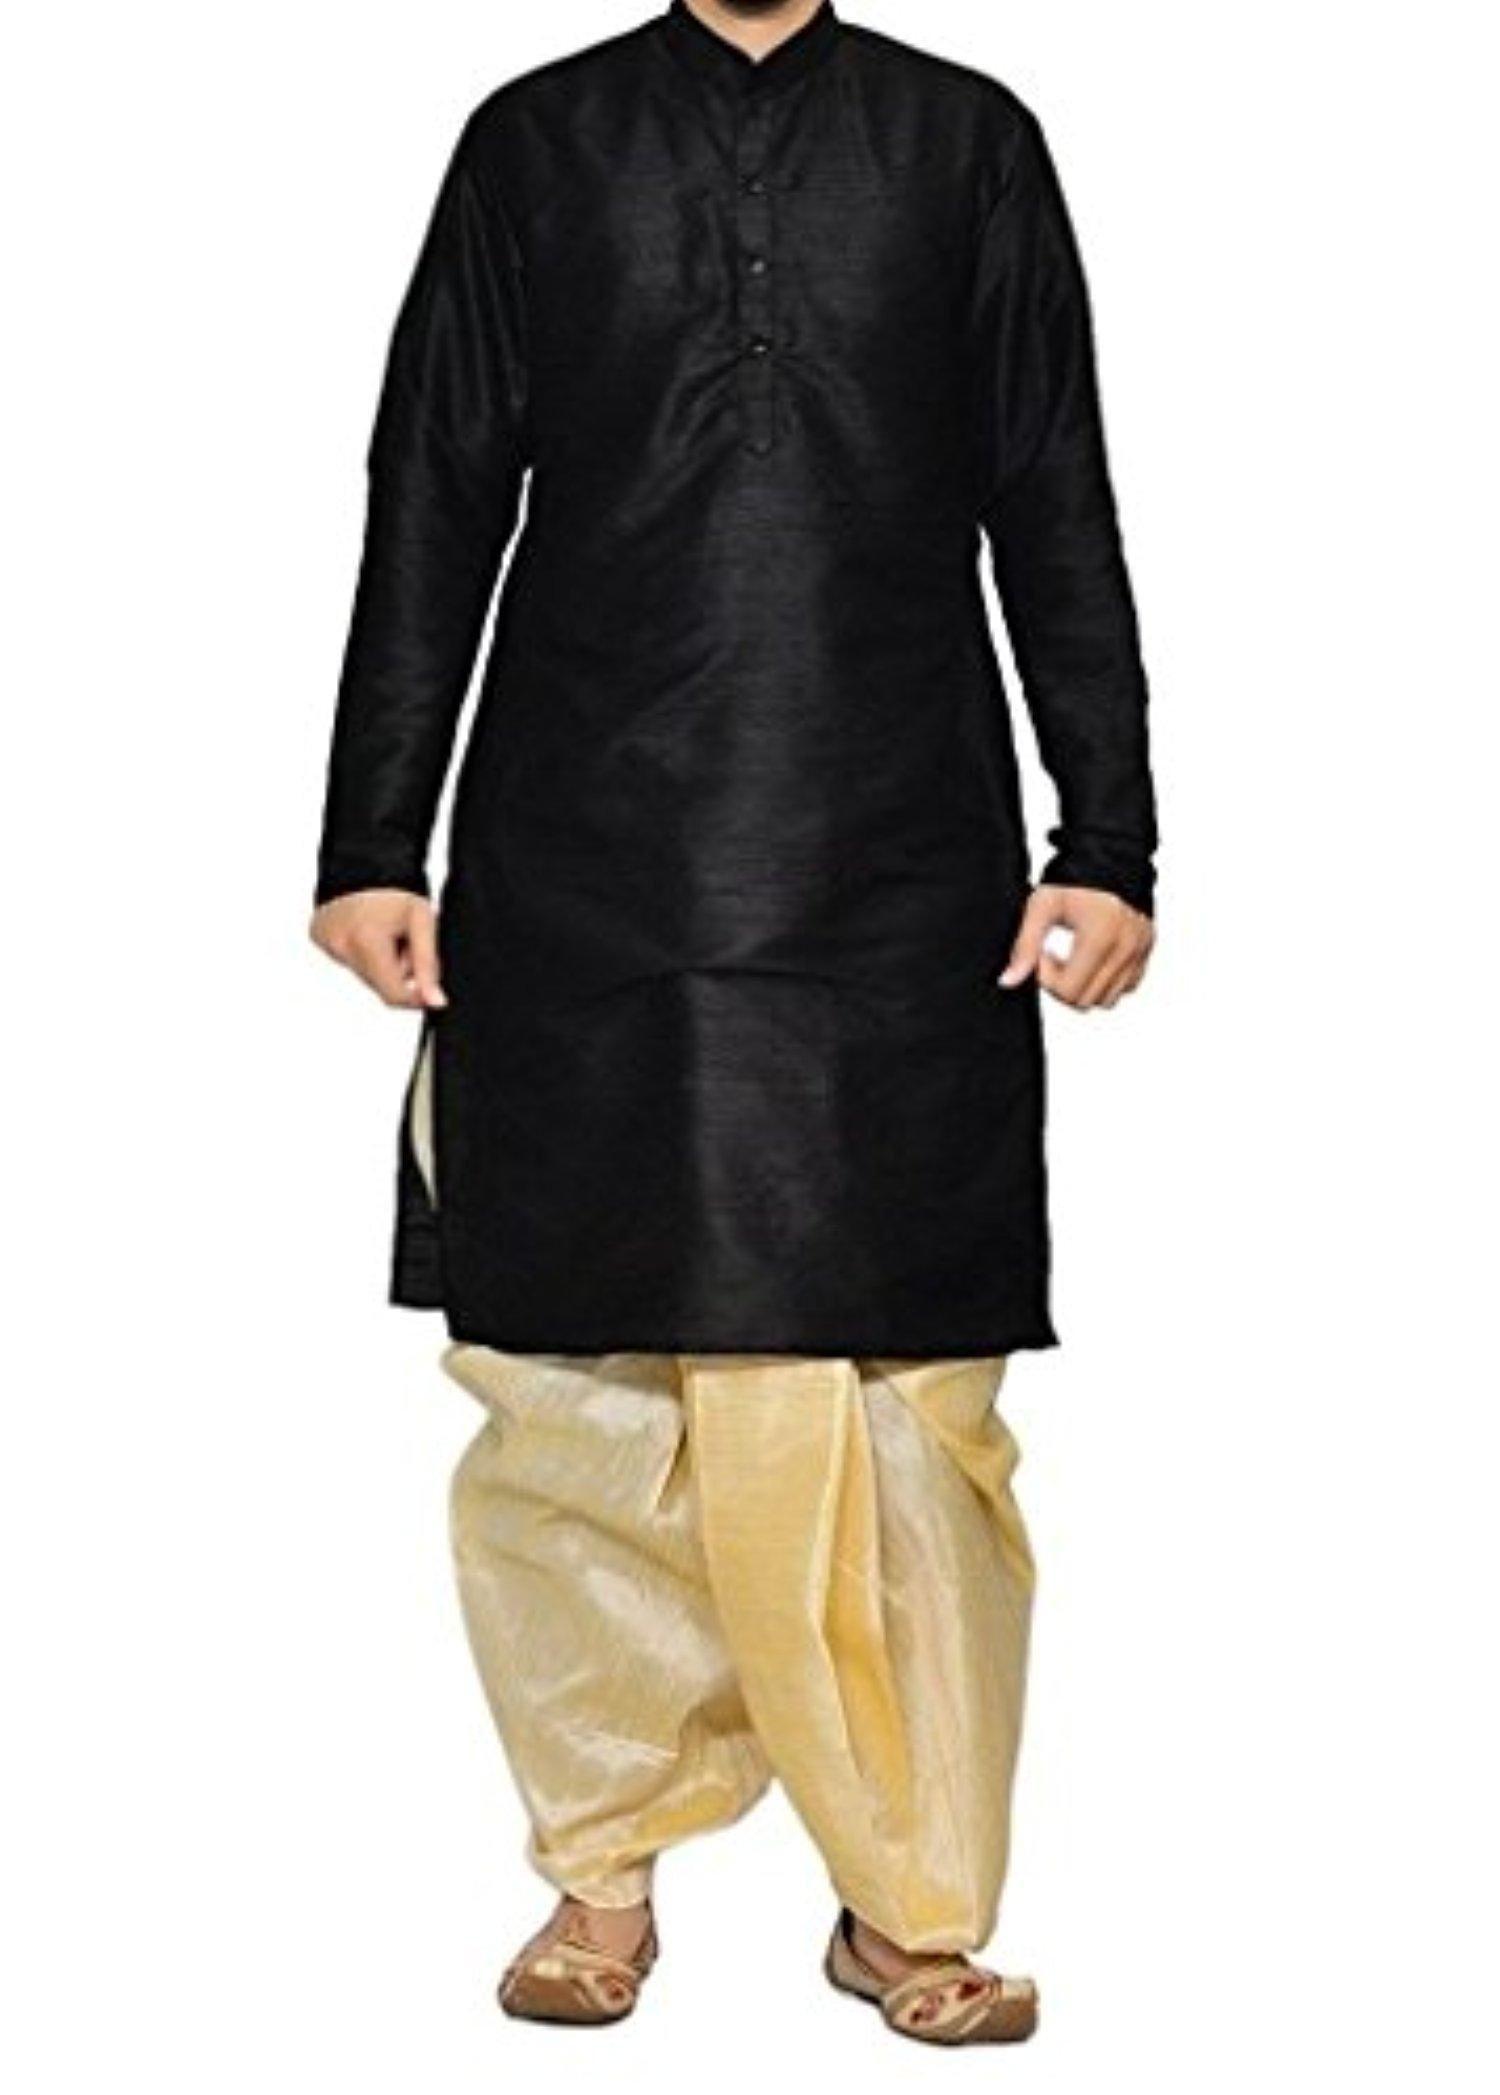 584334bfc2 Royal Kurta Men's Designer Silk Blend Dhoti Kurta 44 Black - Brought to you  by Avarsha.com